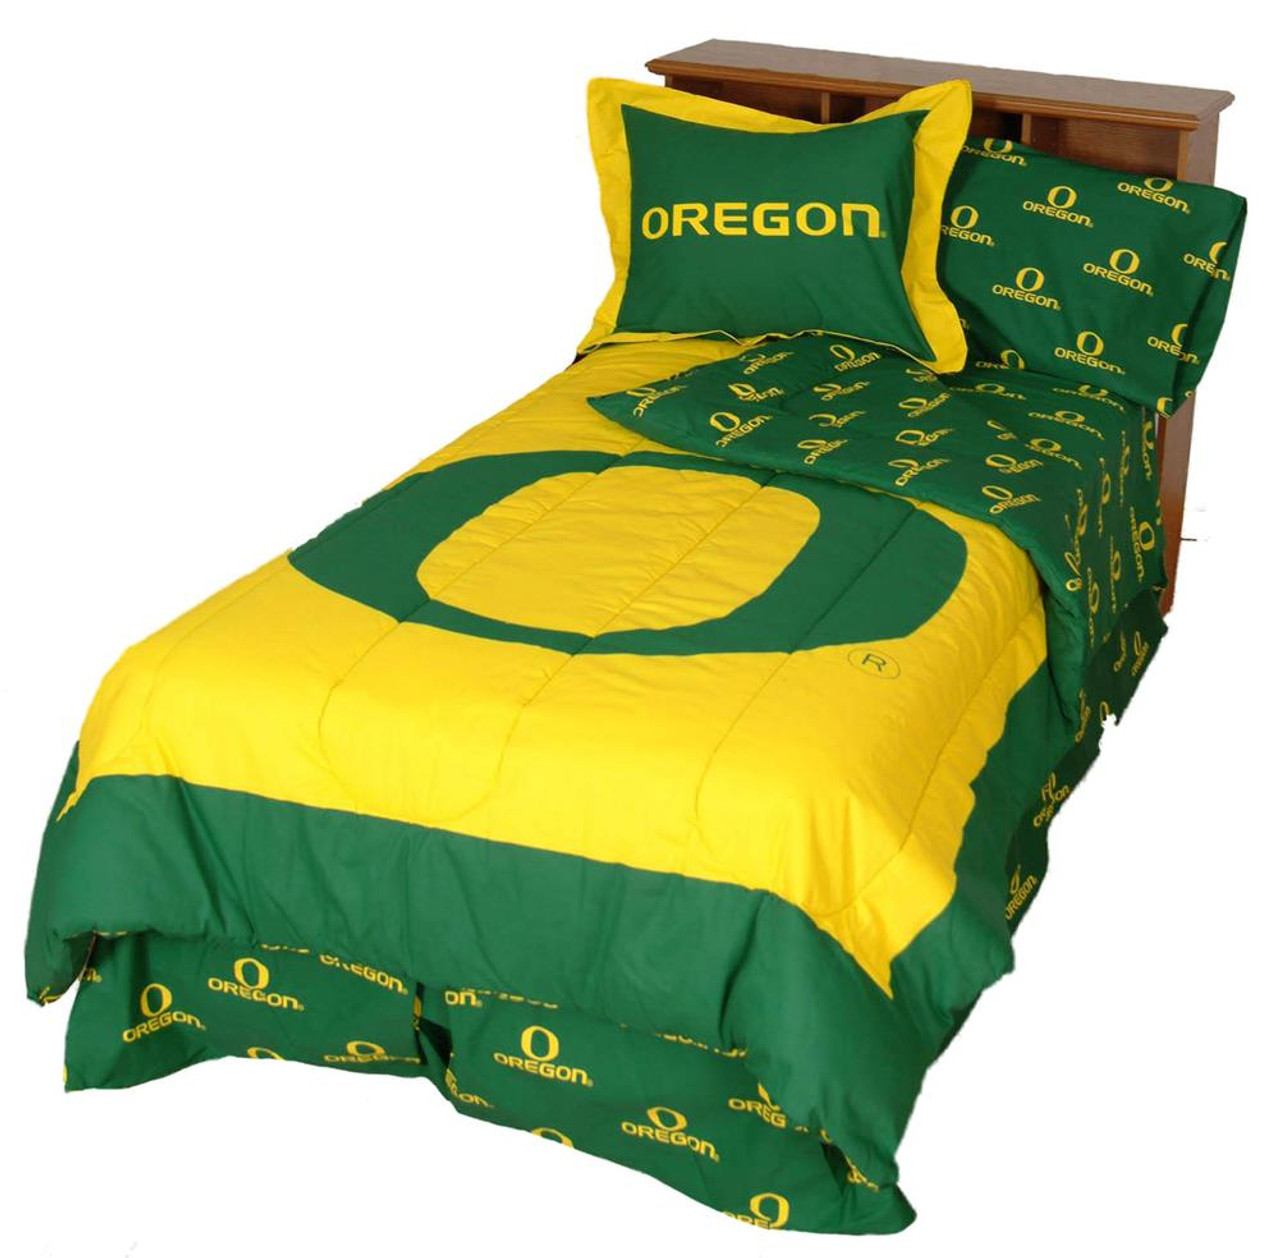 University of Oregon Ducks Comforter Set Revesible Comforter Sham Set